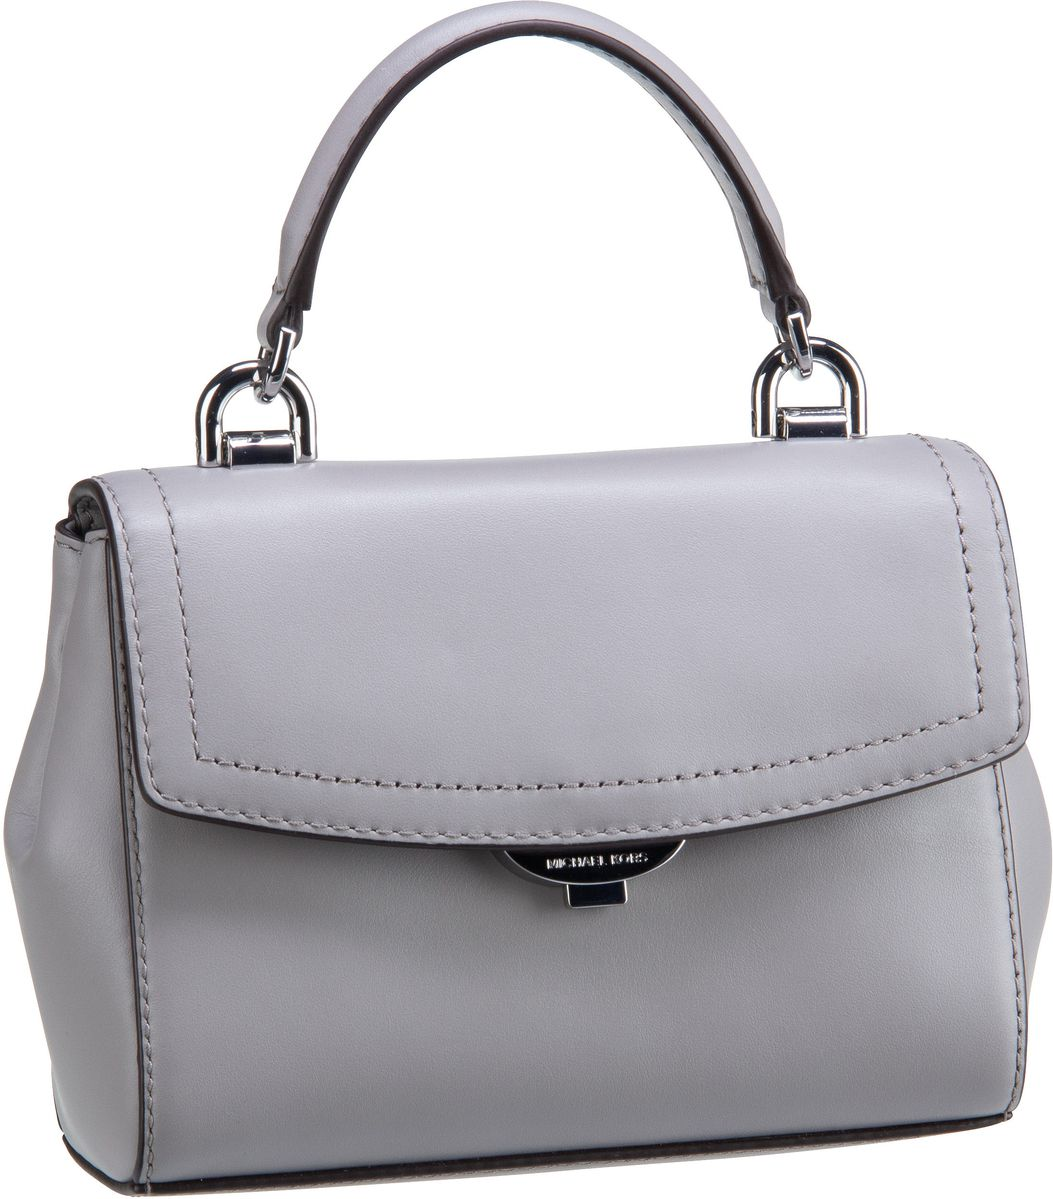 Michael Kors Handtasche Ava XS Crossbody Pearl Grey